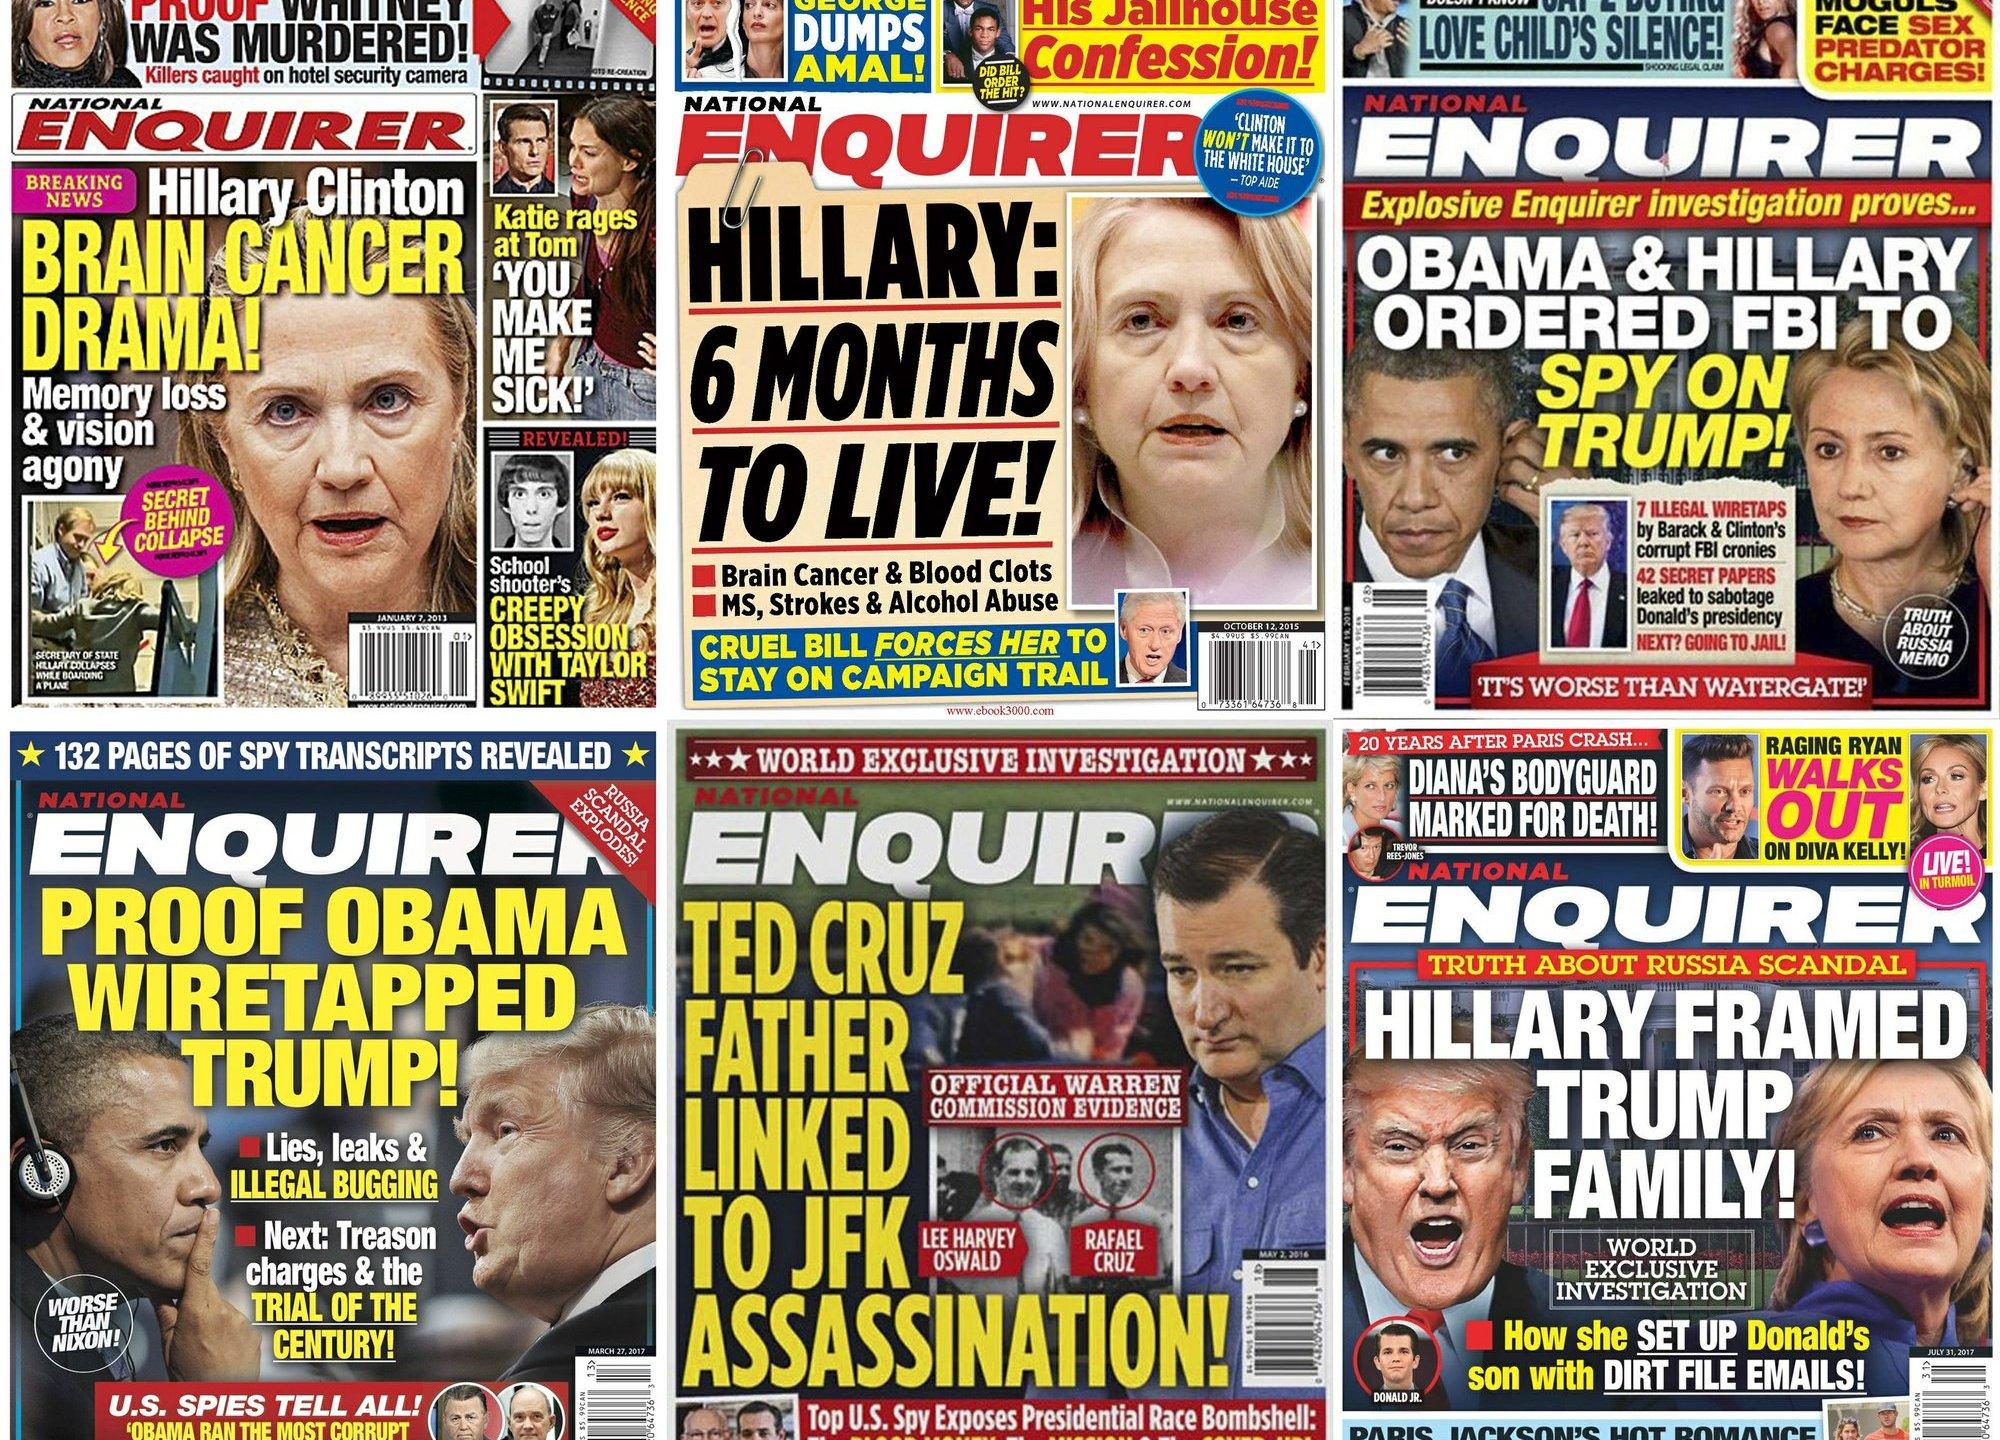 National Enquirer_1544646564772.jpg